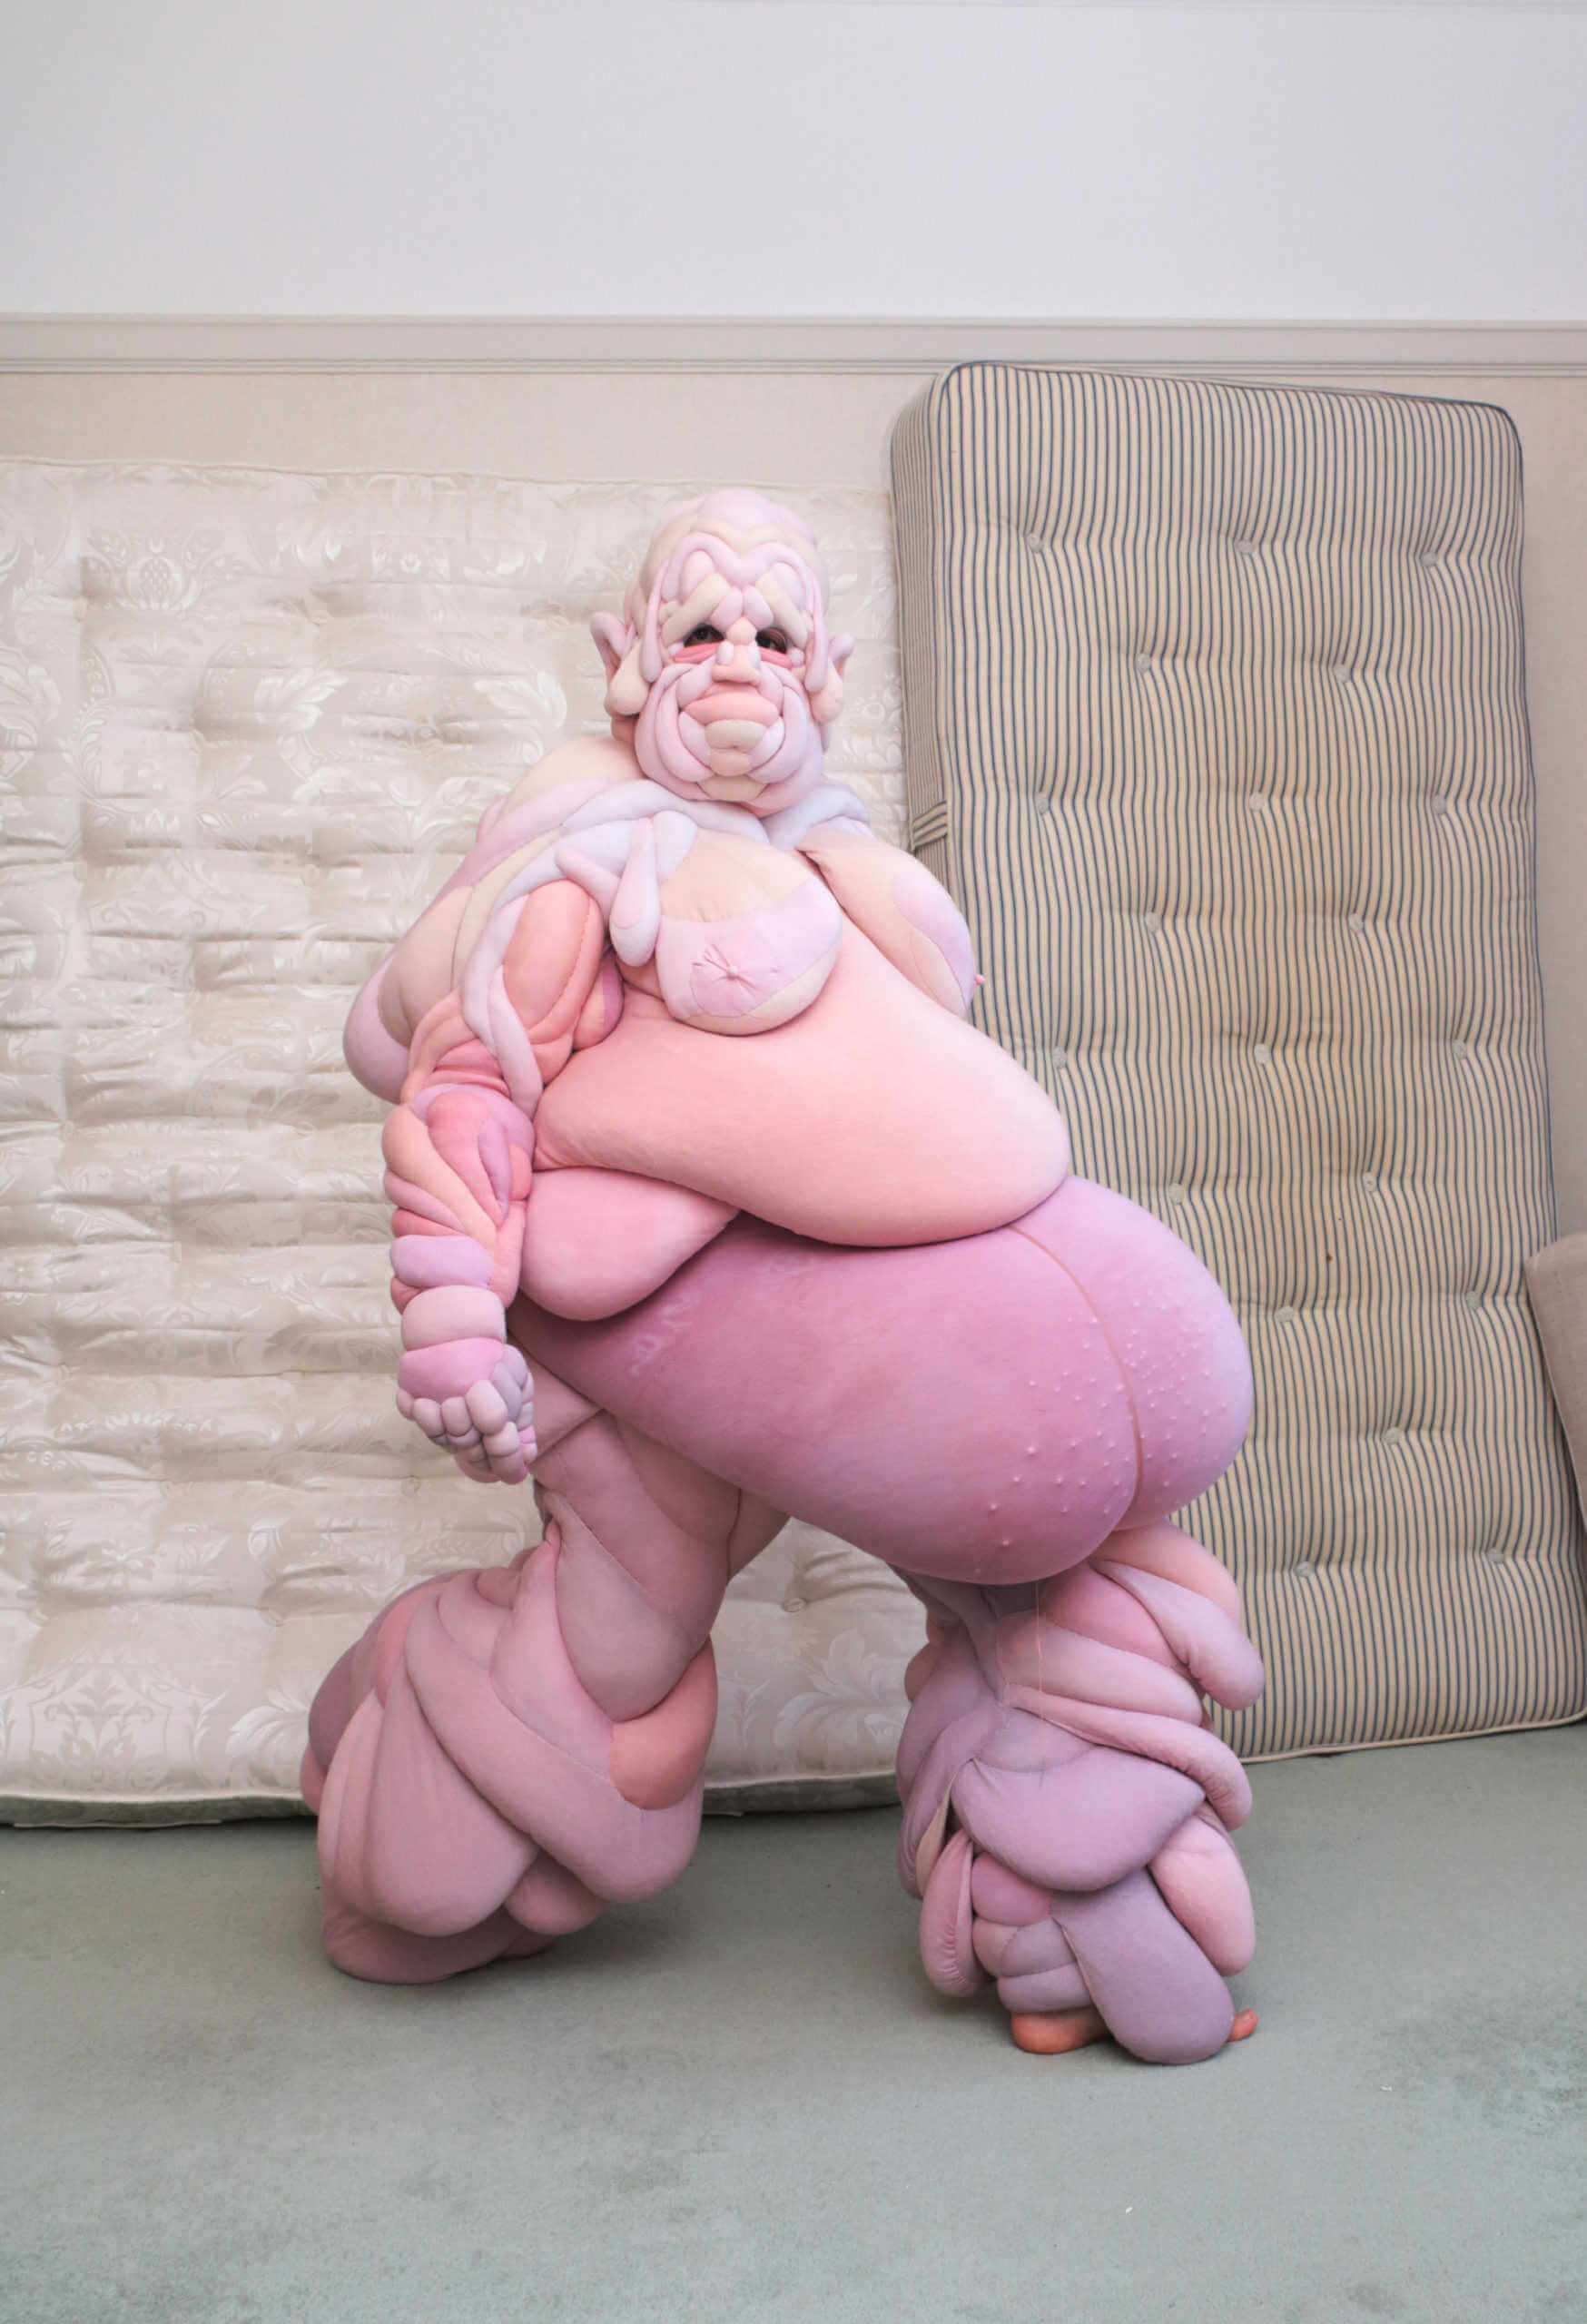 traje alegorico de la imagen corporal diseñoado por la artista londinense Daisy Collingridge